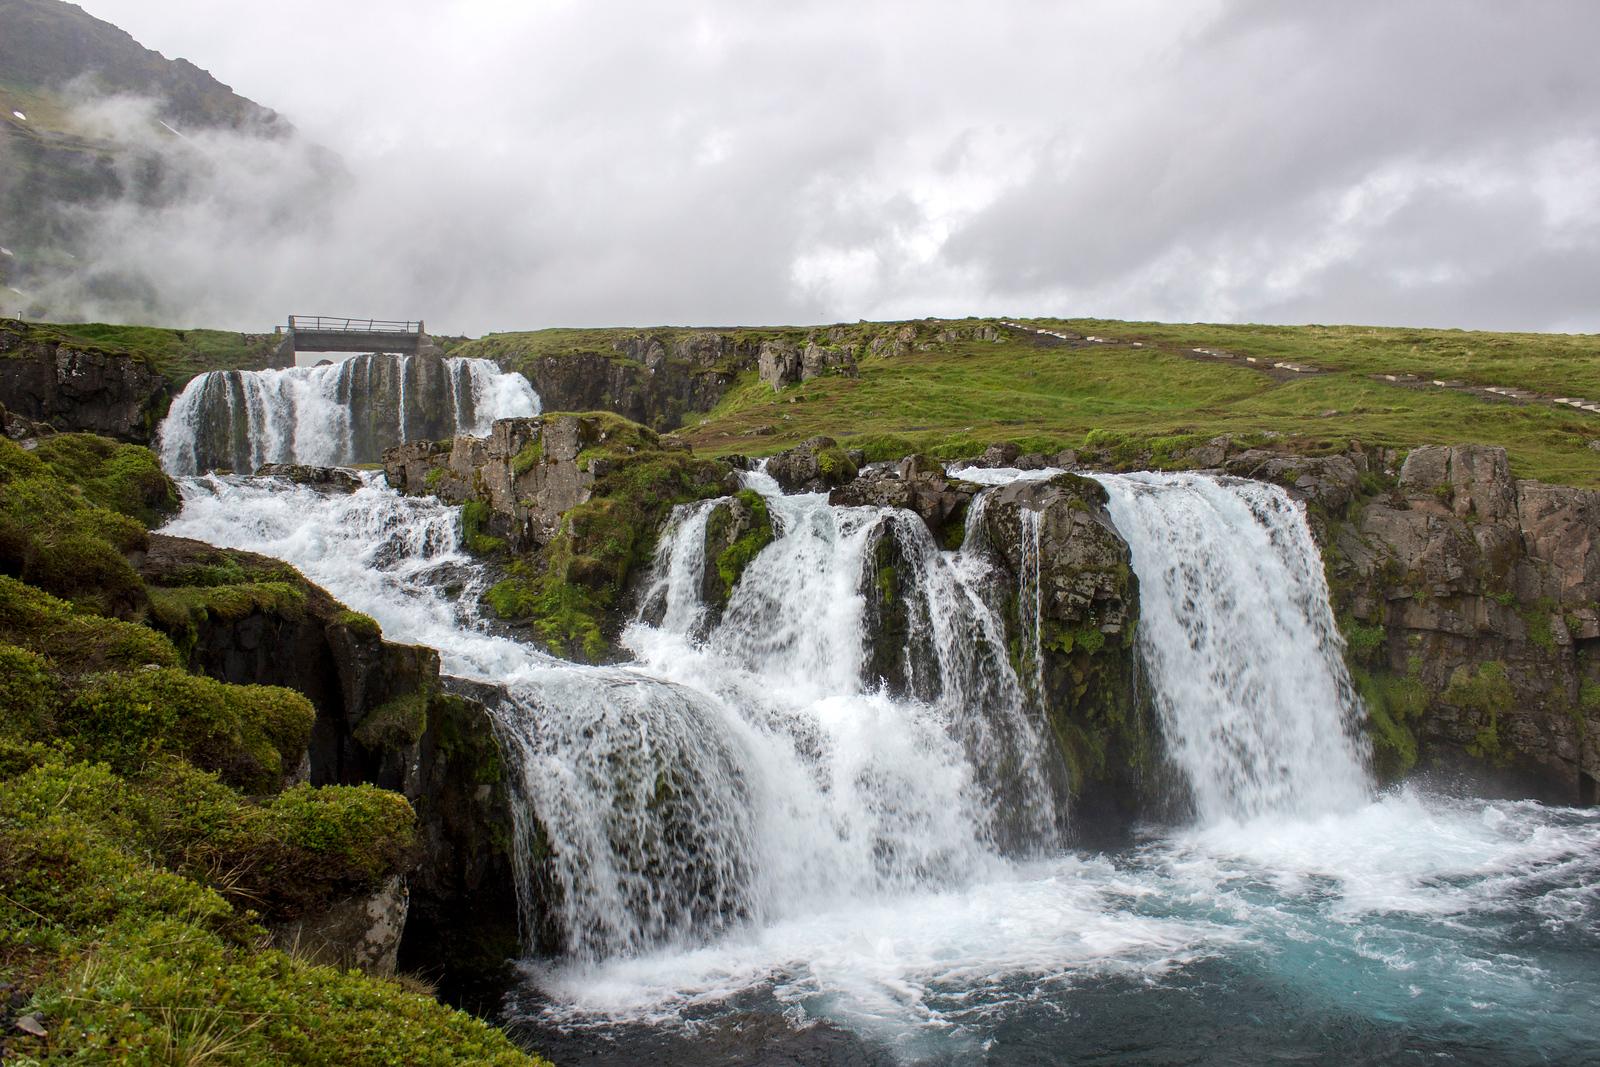 Kirkjufell waterfalls. Snæfellsnes Peninsula Iceland Day Trip Travel Guide.